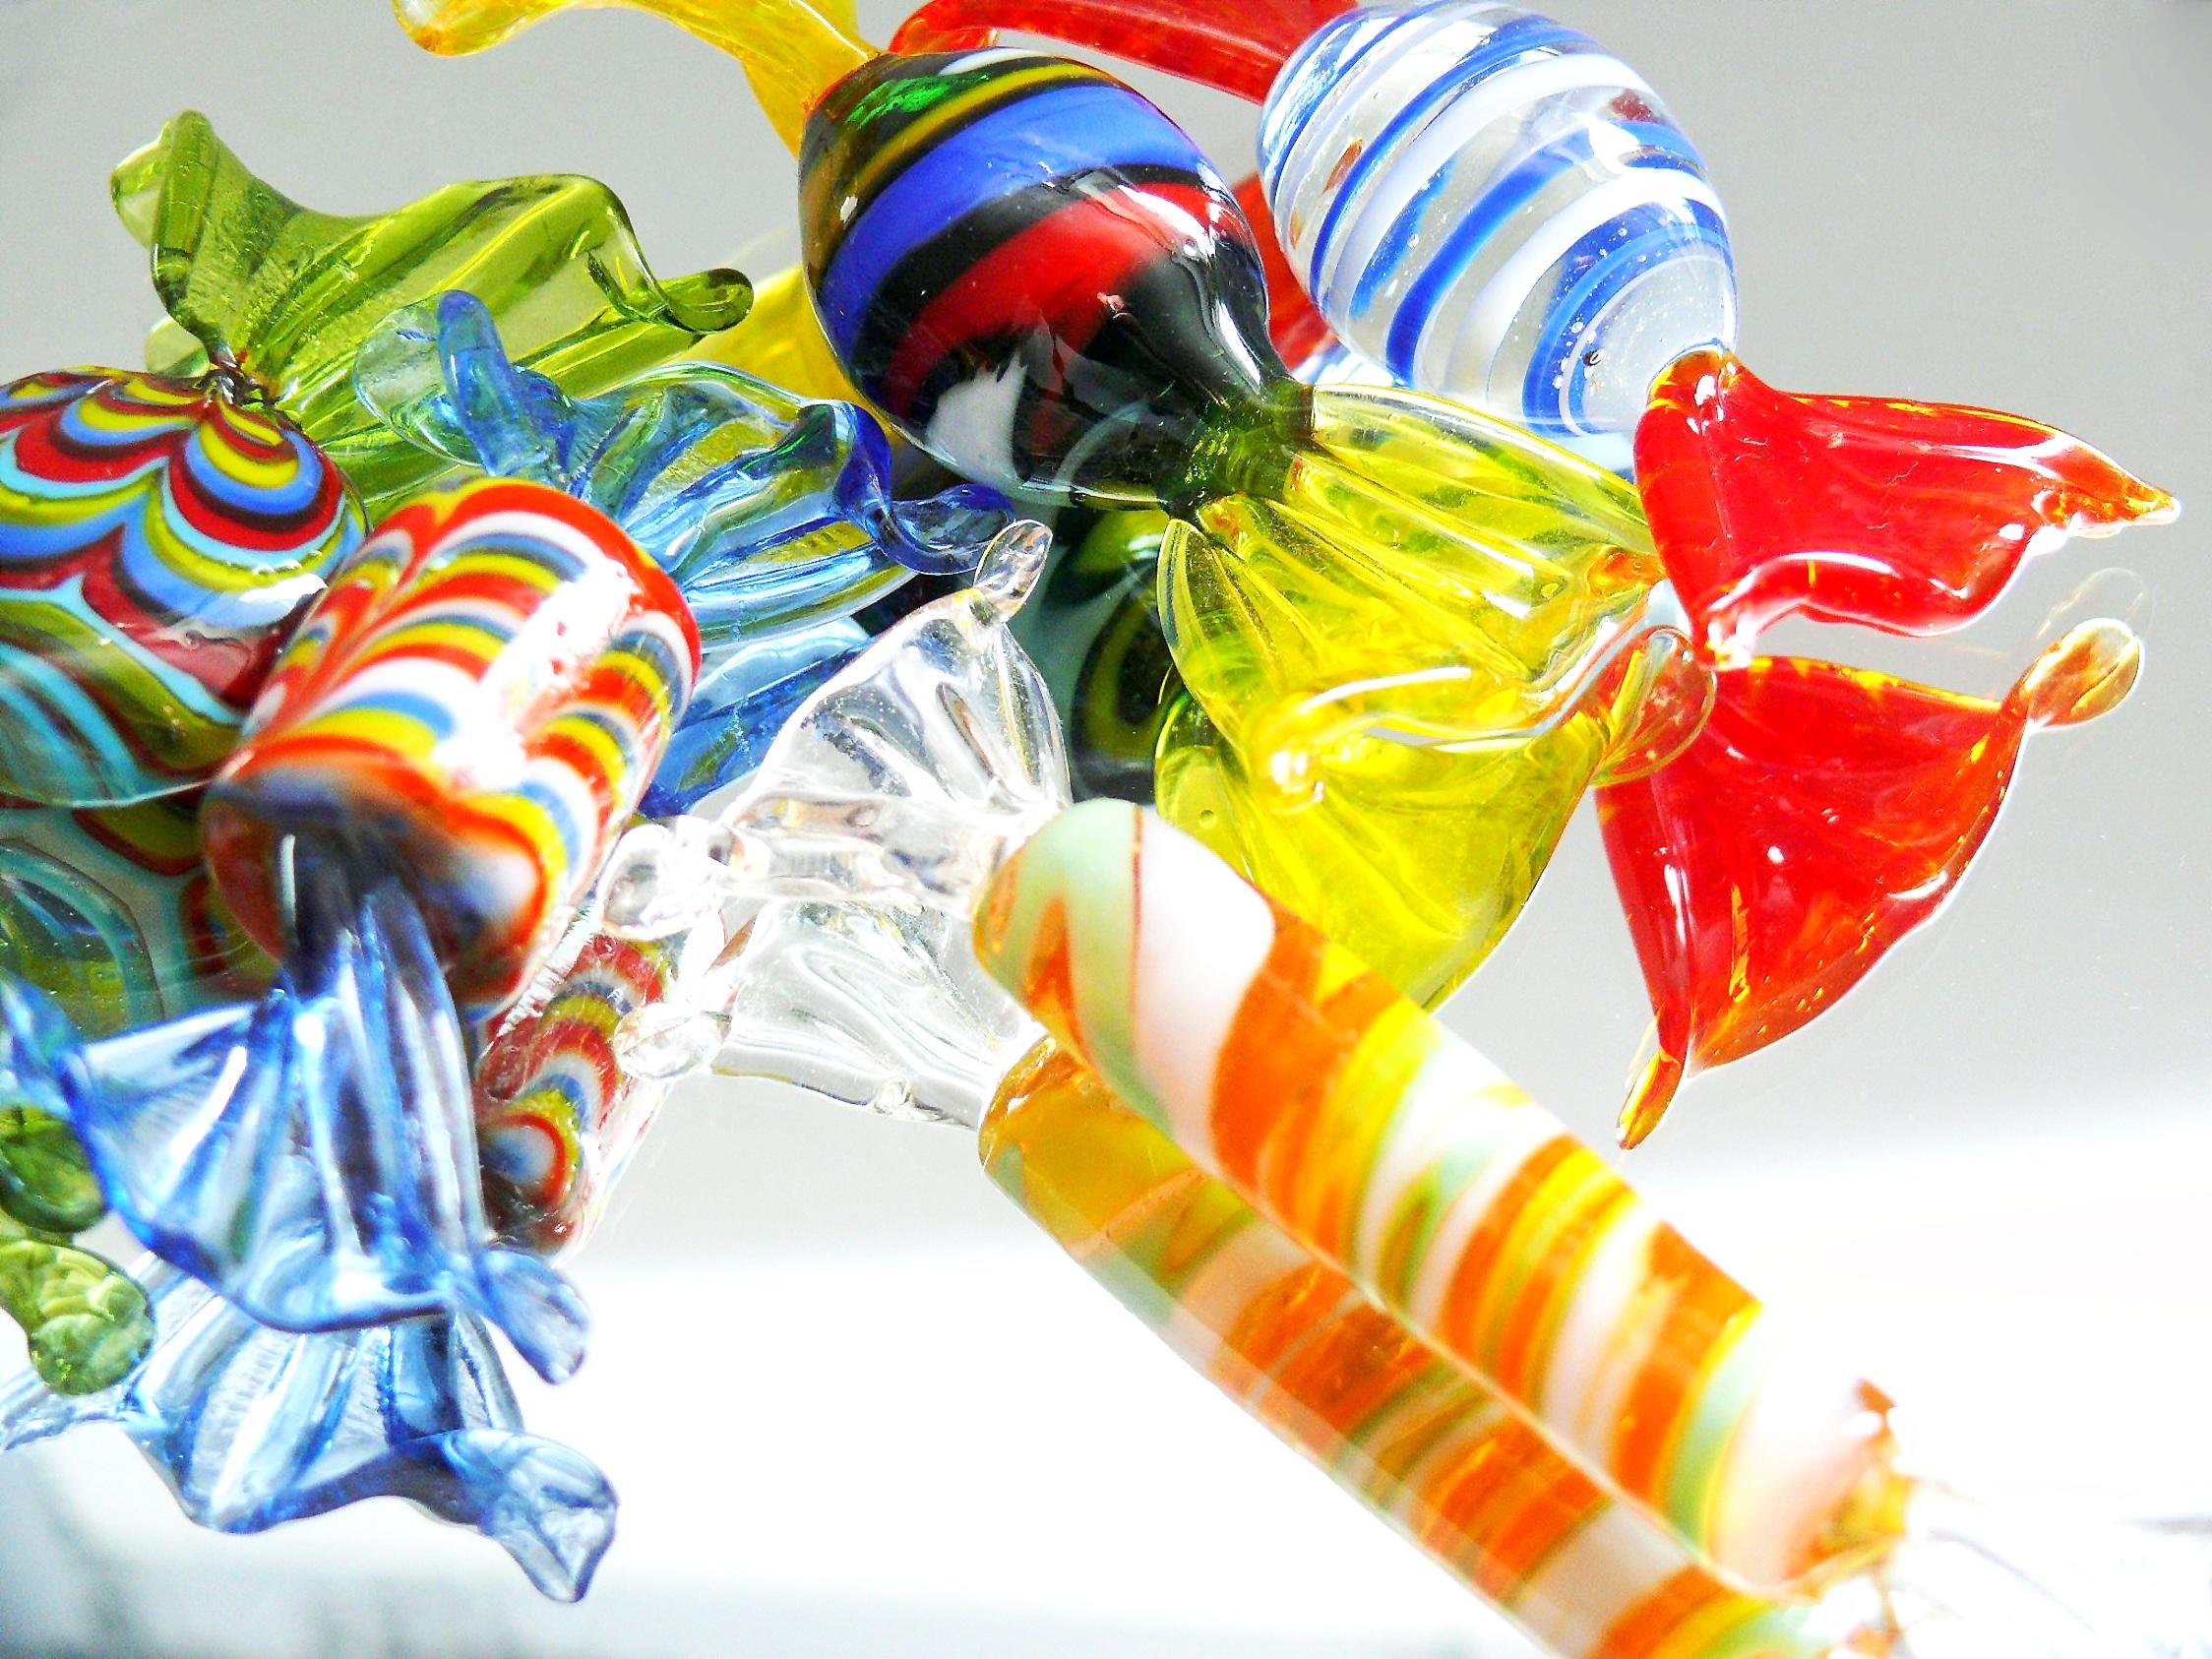 Kostenlose foto : Natur, Glas, Lebensmittel, Grün, rot, Farbe, blau ...